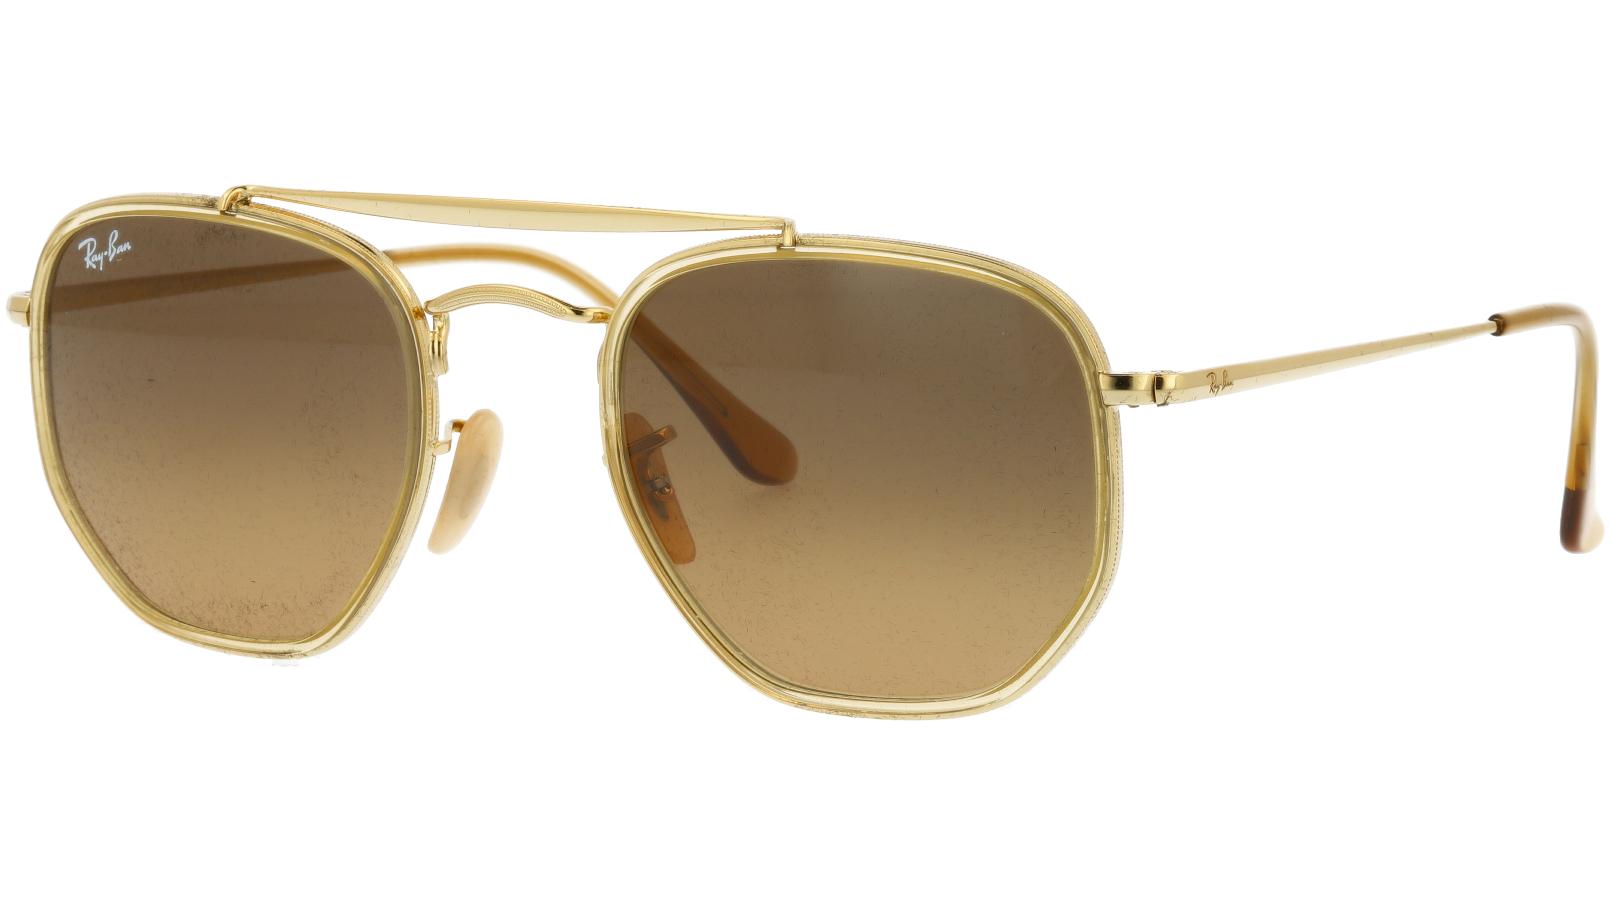 Ray-Ban RB3648M 912443 52 Arista Sunglasses